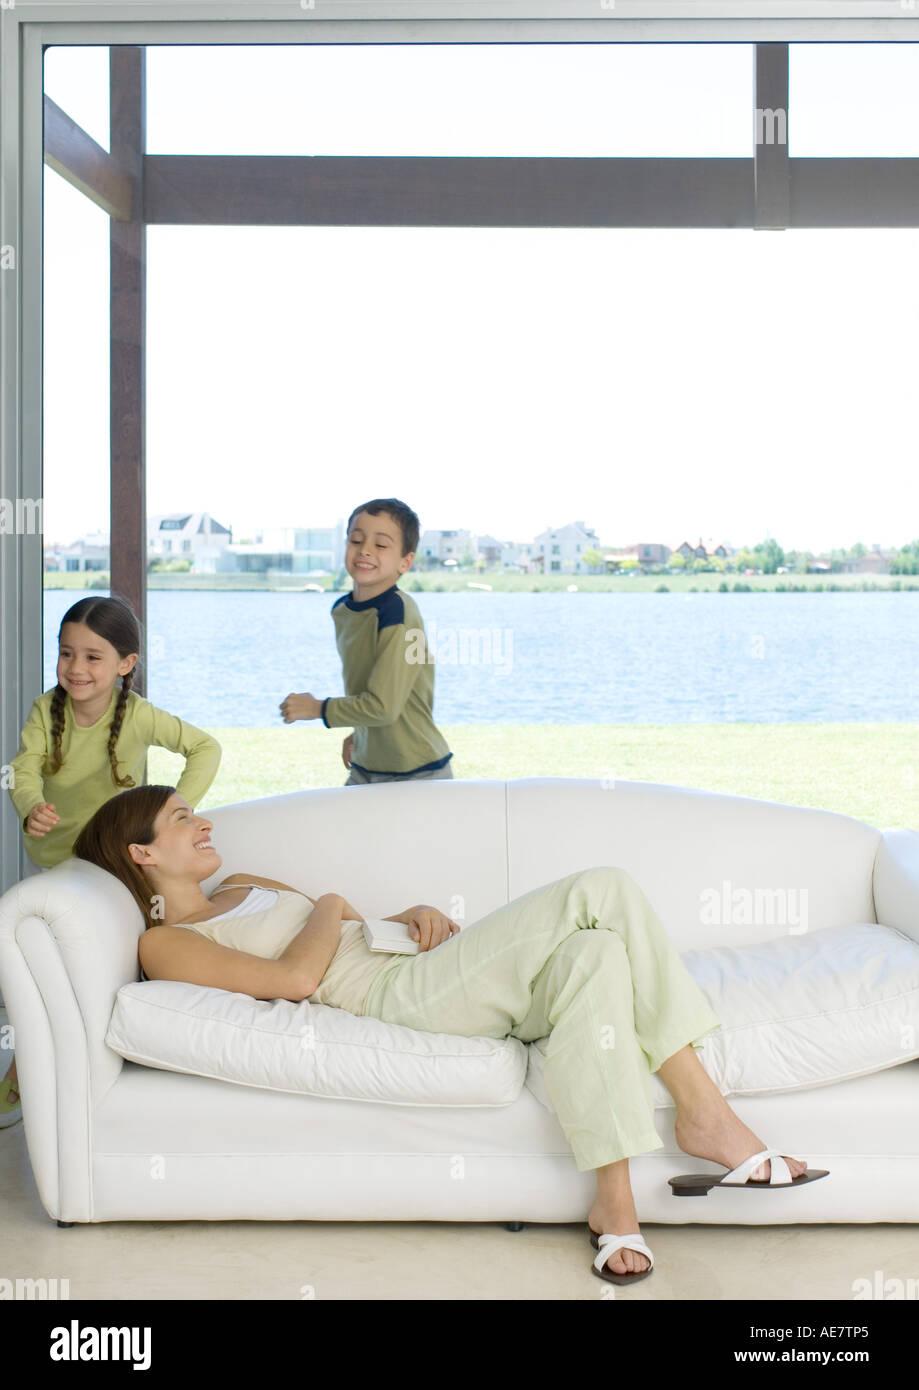 Mother reclining on sofa while children run around her Stock Photo